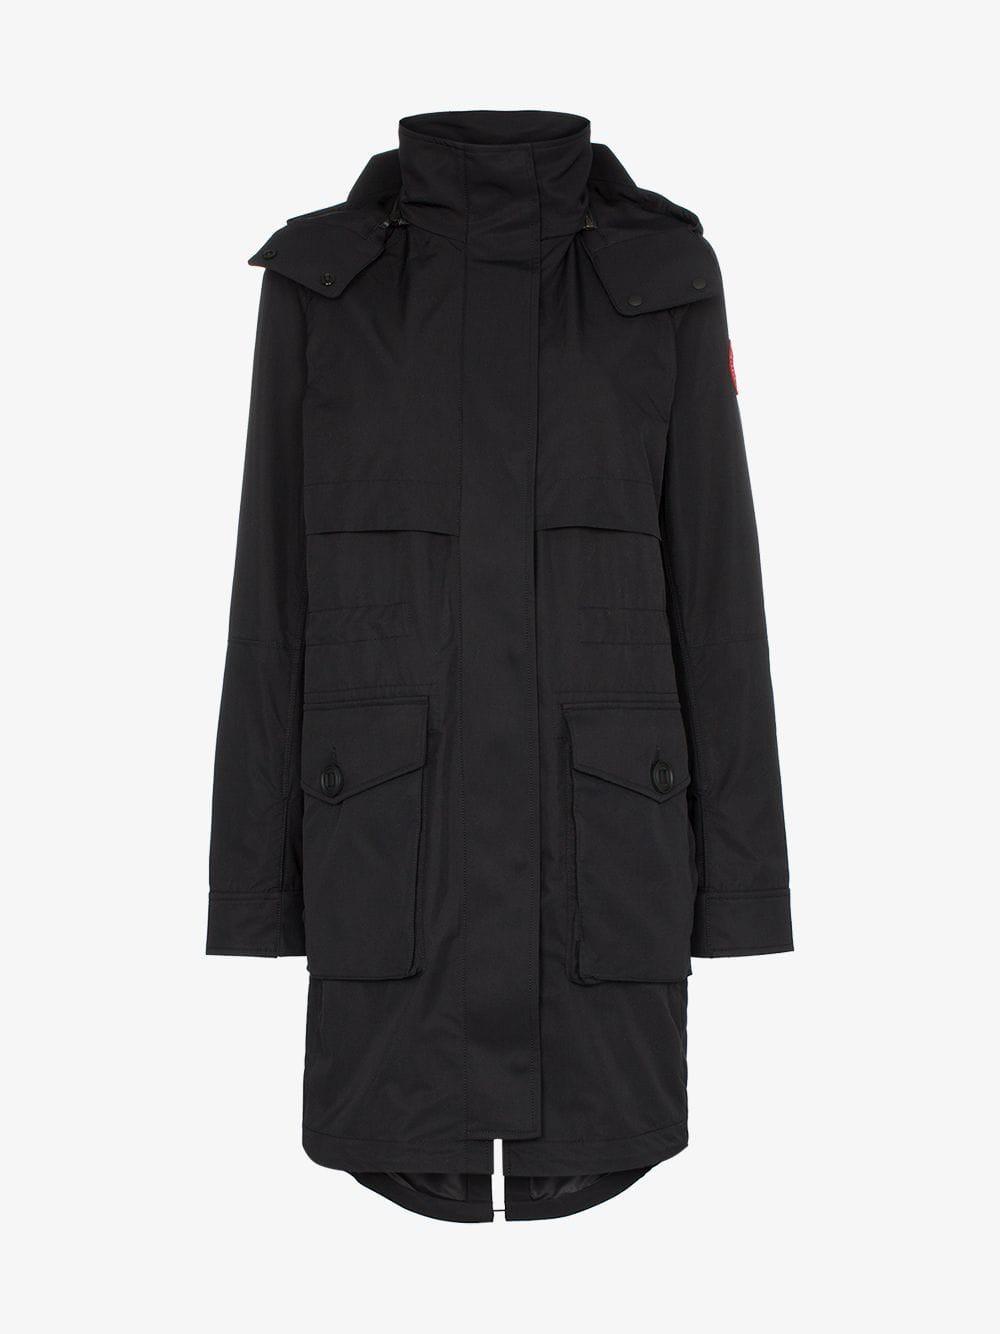 Canada Goose Cavalry trench coat in black